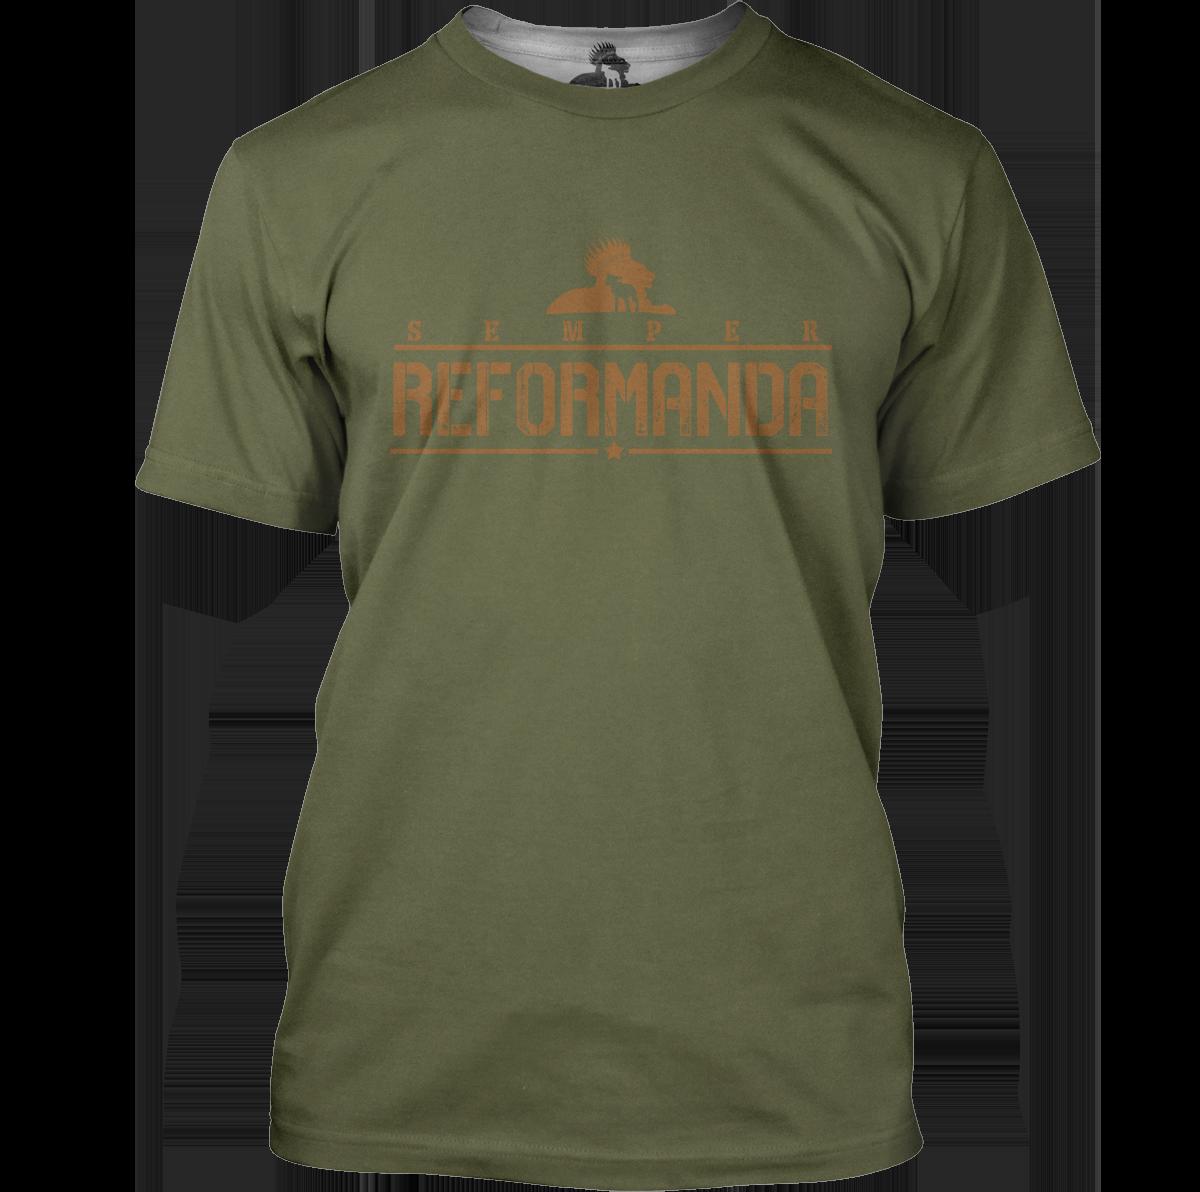 Online store semper reformanda. Clothes clipart soldier